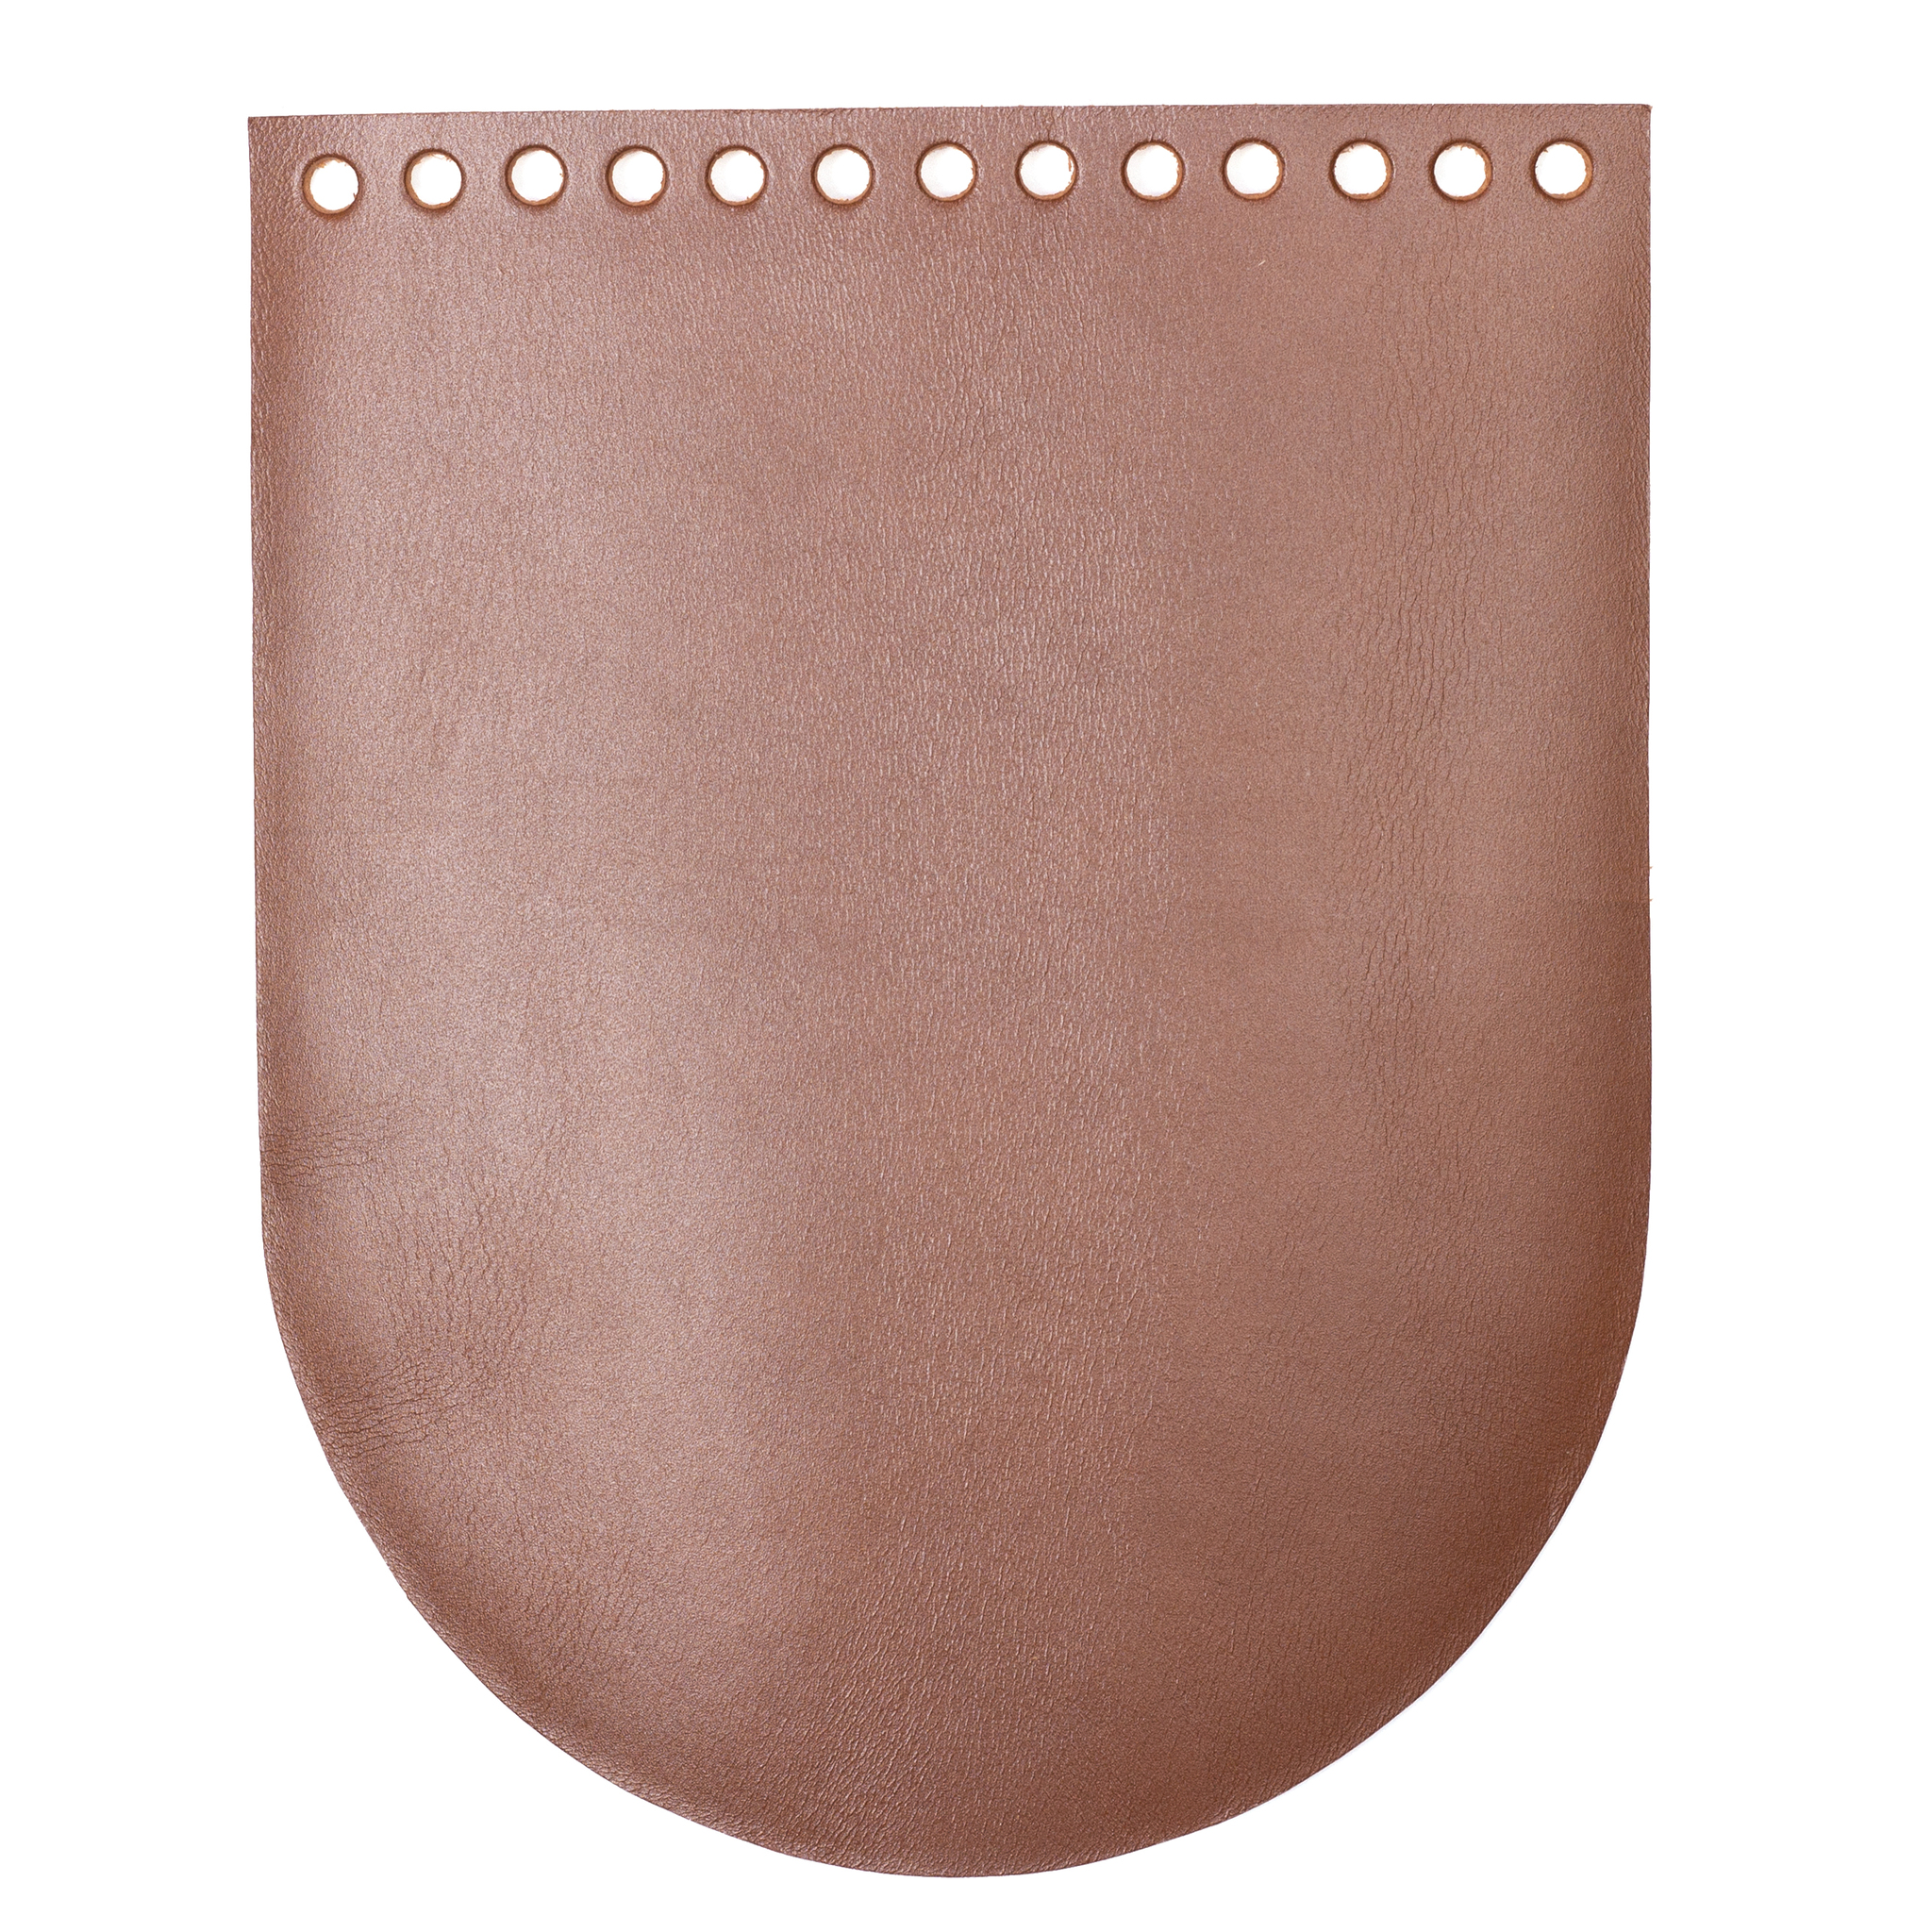 "Вся фурнитура Клапан для сумочки кожаный ""Корица"" 19,5 см на 15,5 см IMG_2390.jpg"